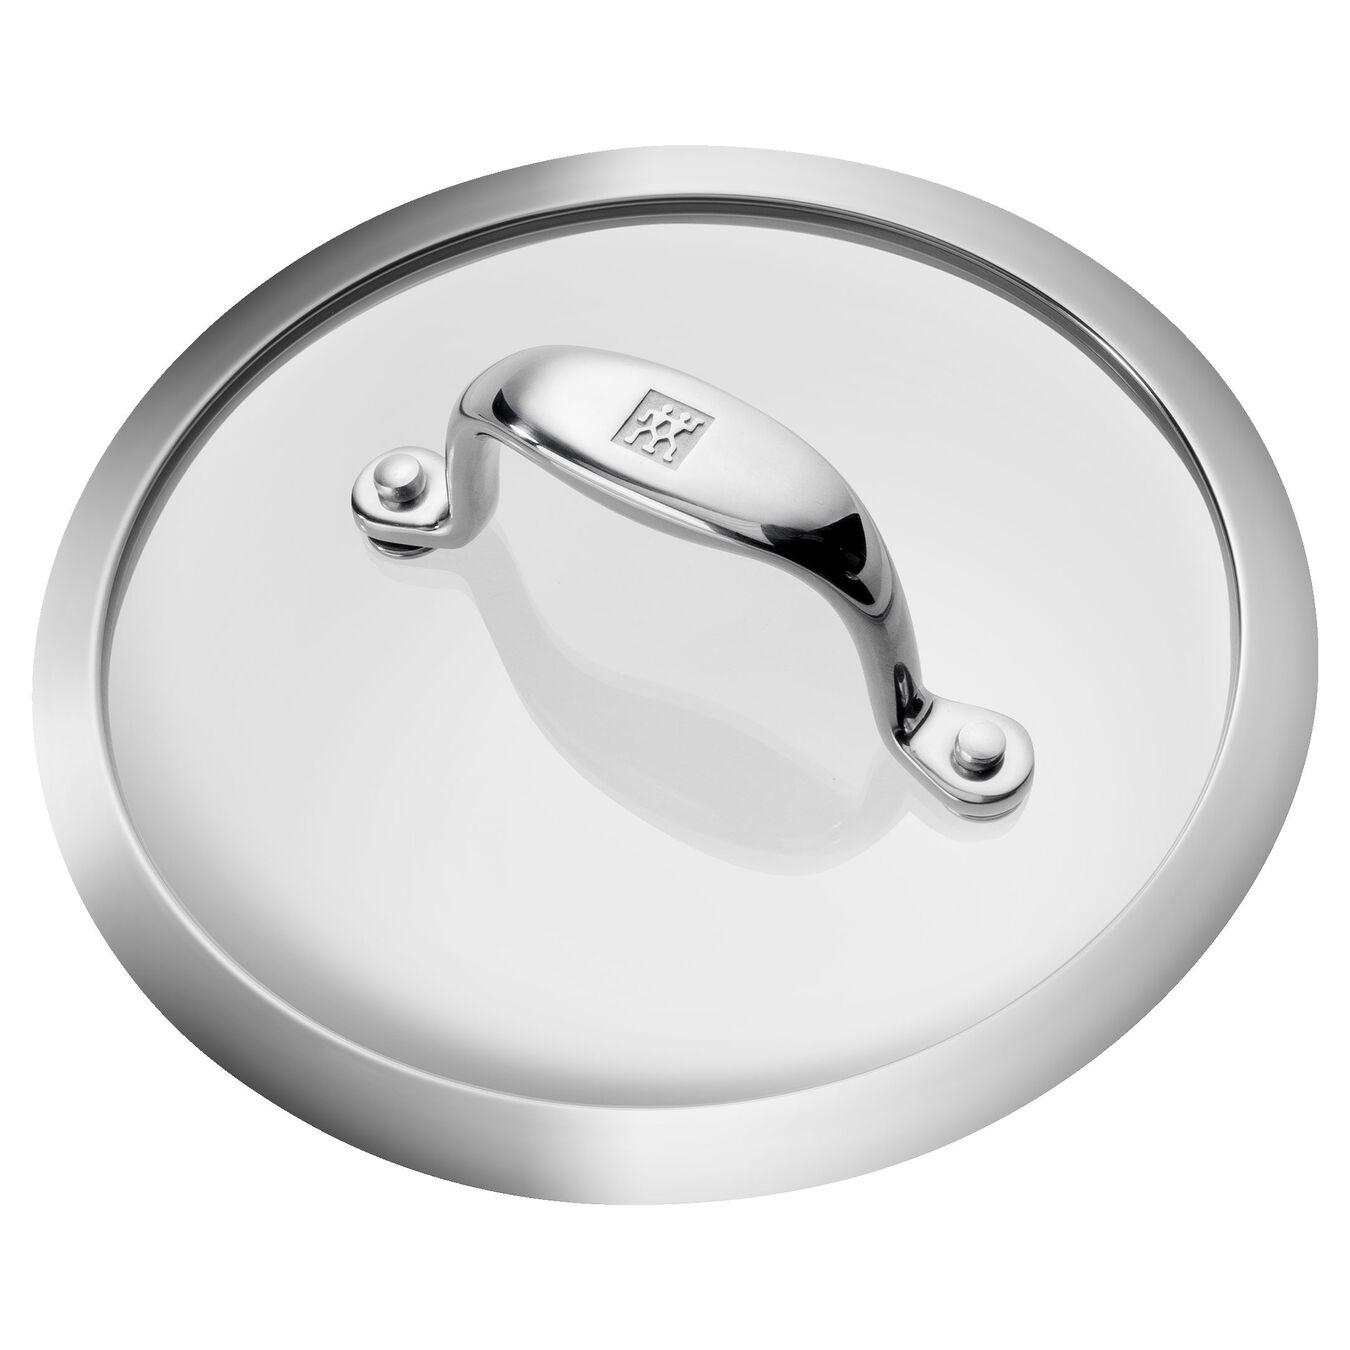 Casserole 16 cm, Aluminium, Silver-Black,,large 6